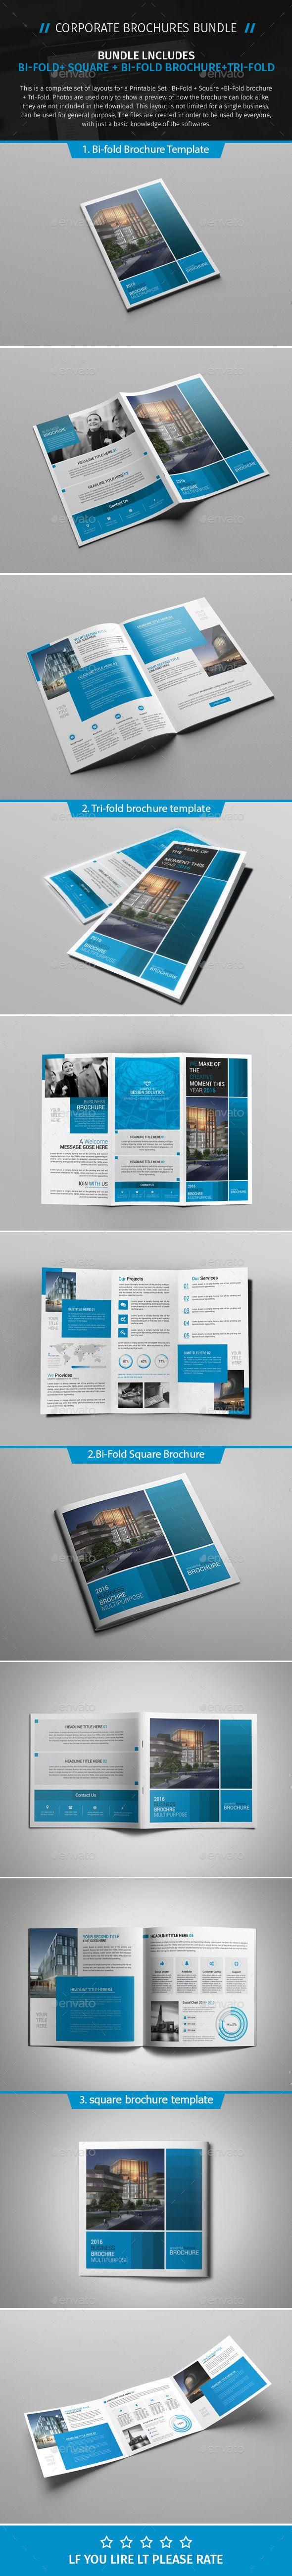 Brochure Bundle 05  — PSD Template #ad #clean • Download ➝ https://graphicriver.net/item/brochure-bundle-05/18200877?ref=pxcr